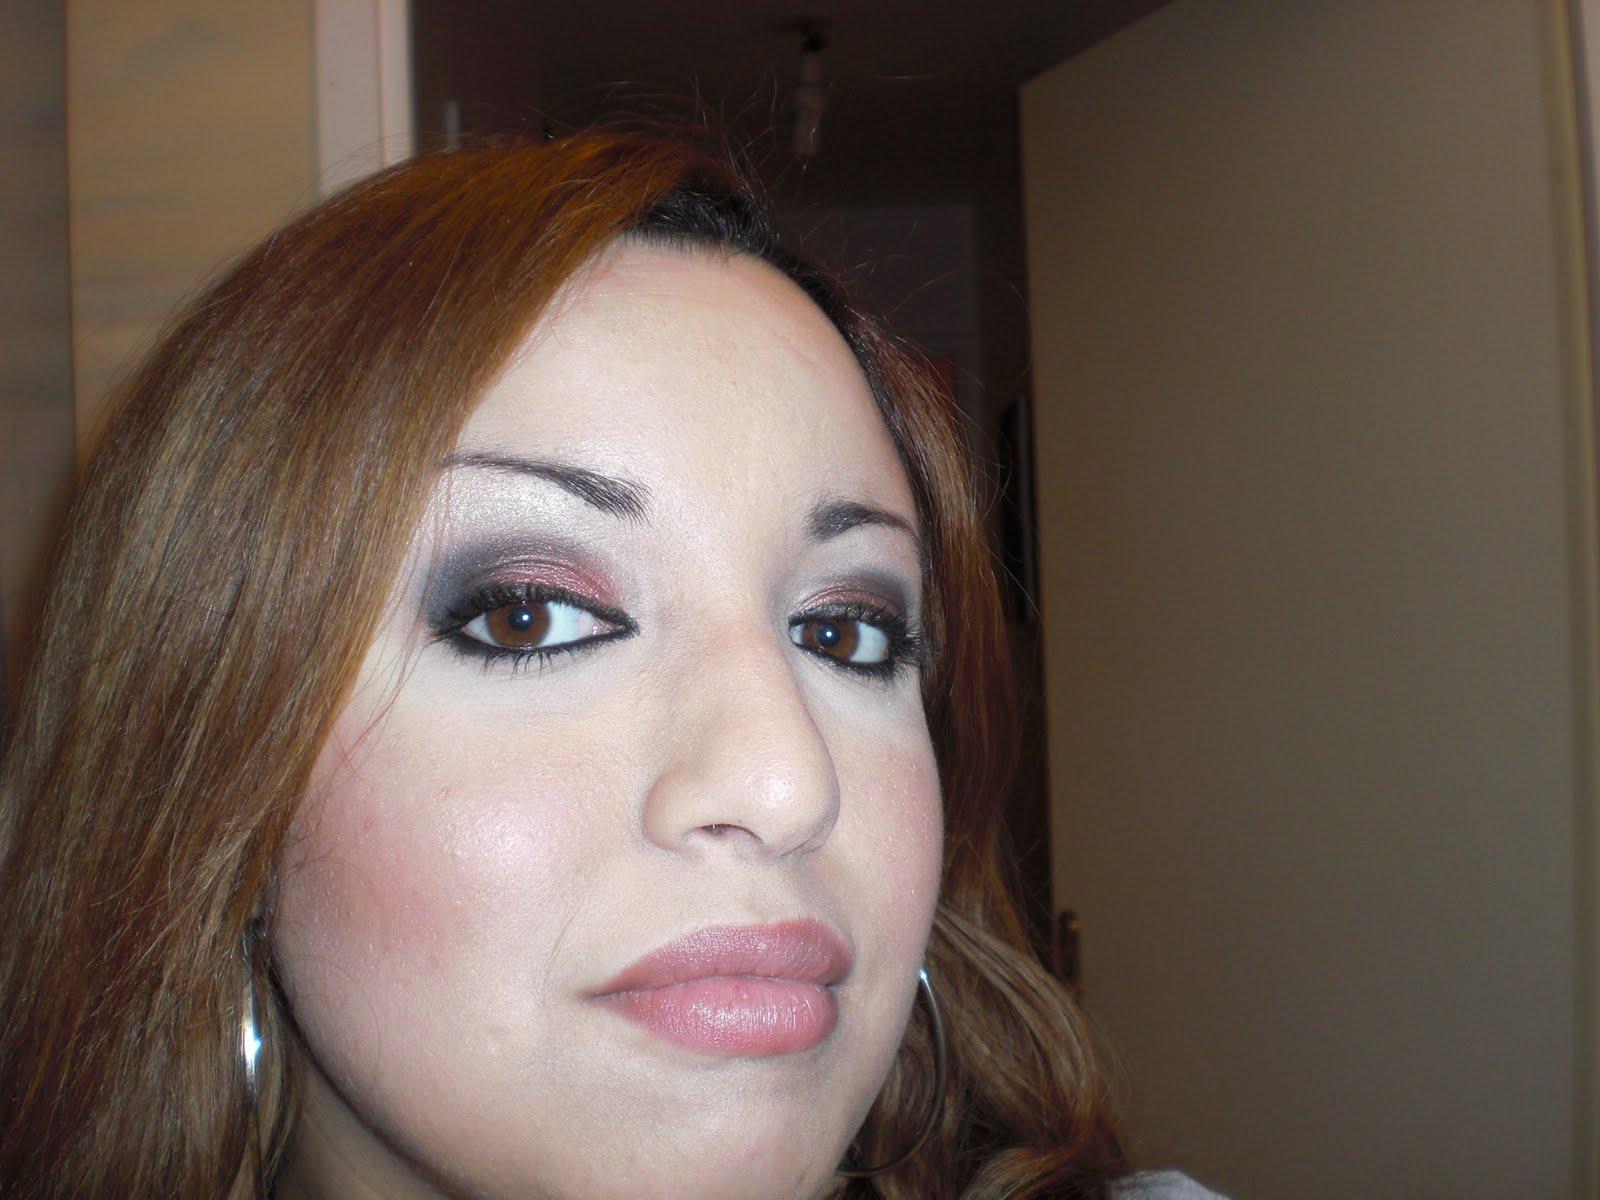 Big dolls boudoir maquillage du soir smoky eyes - Maquillage smoky eyes ...